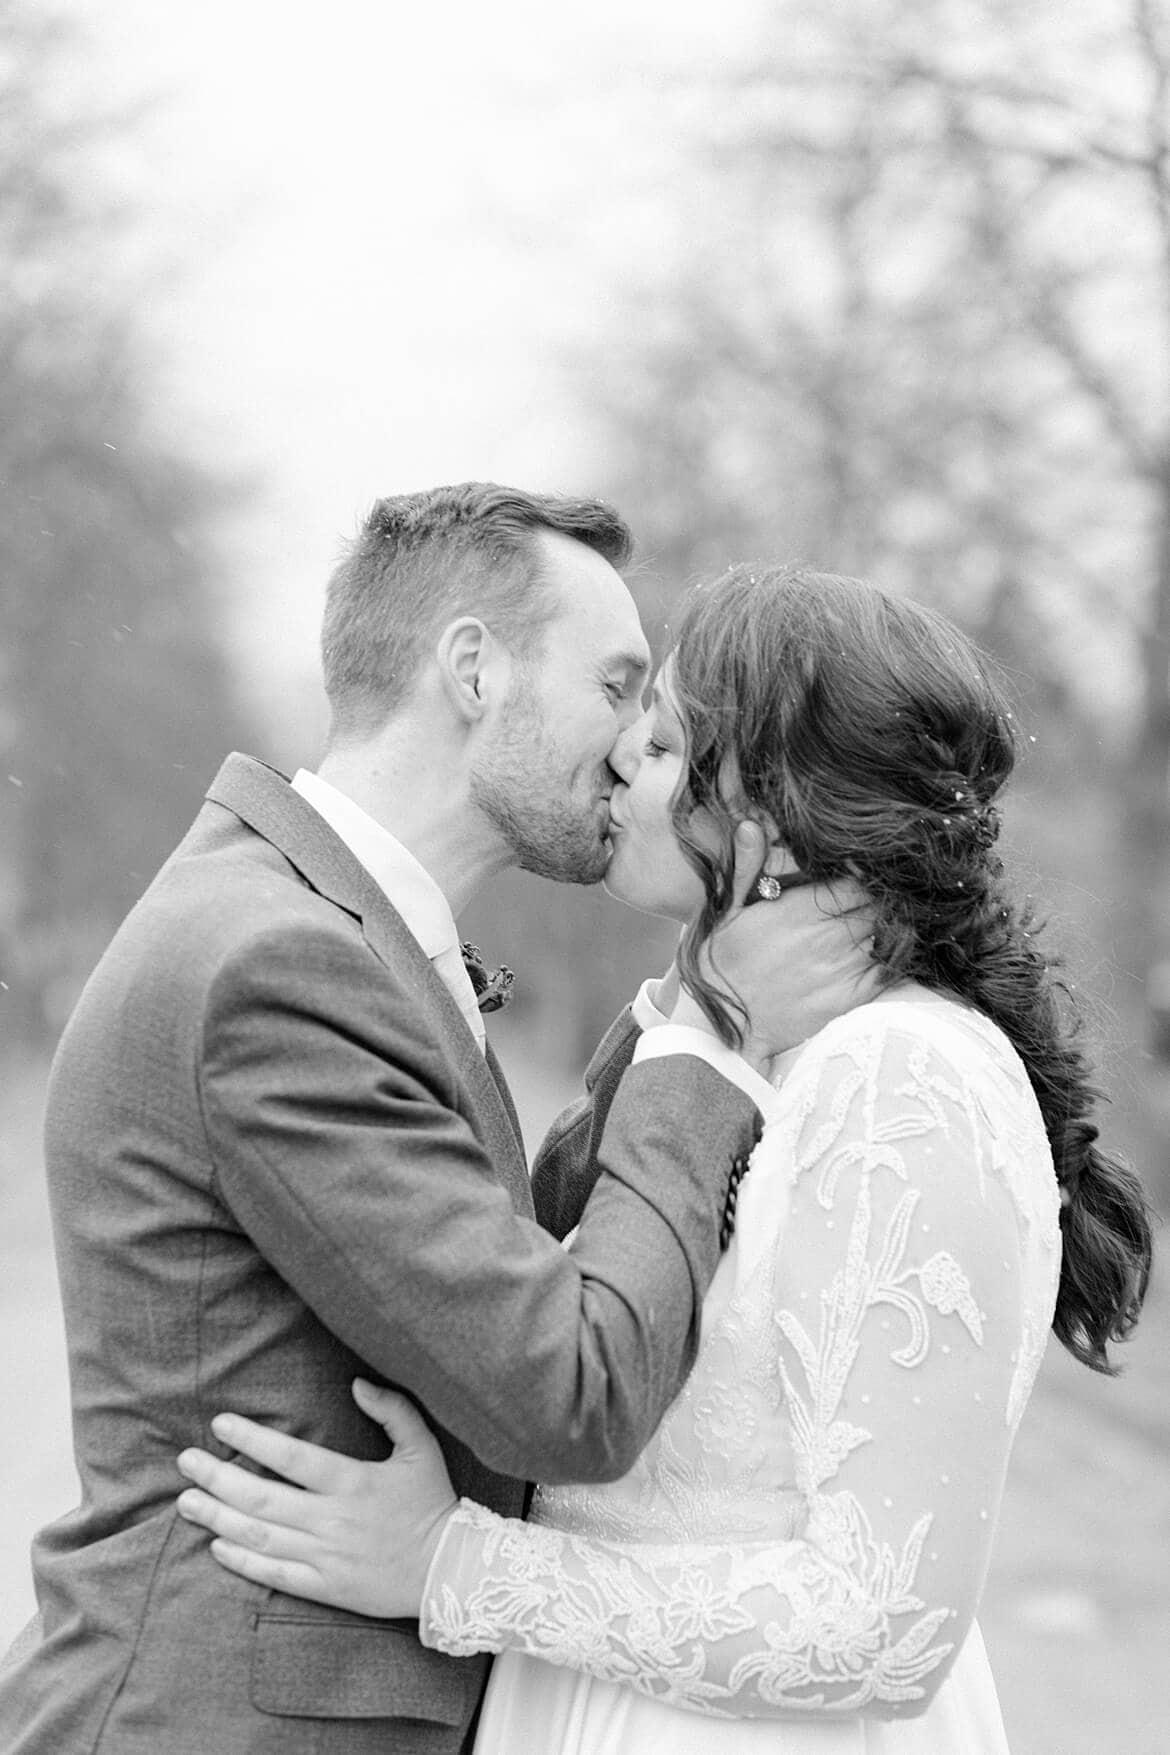 Bräutigam küsst seine Braut innig